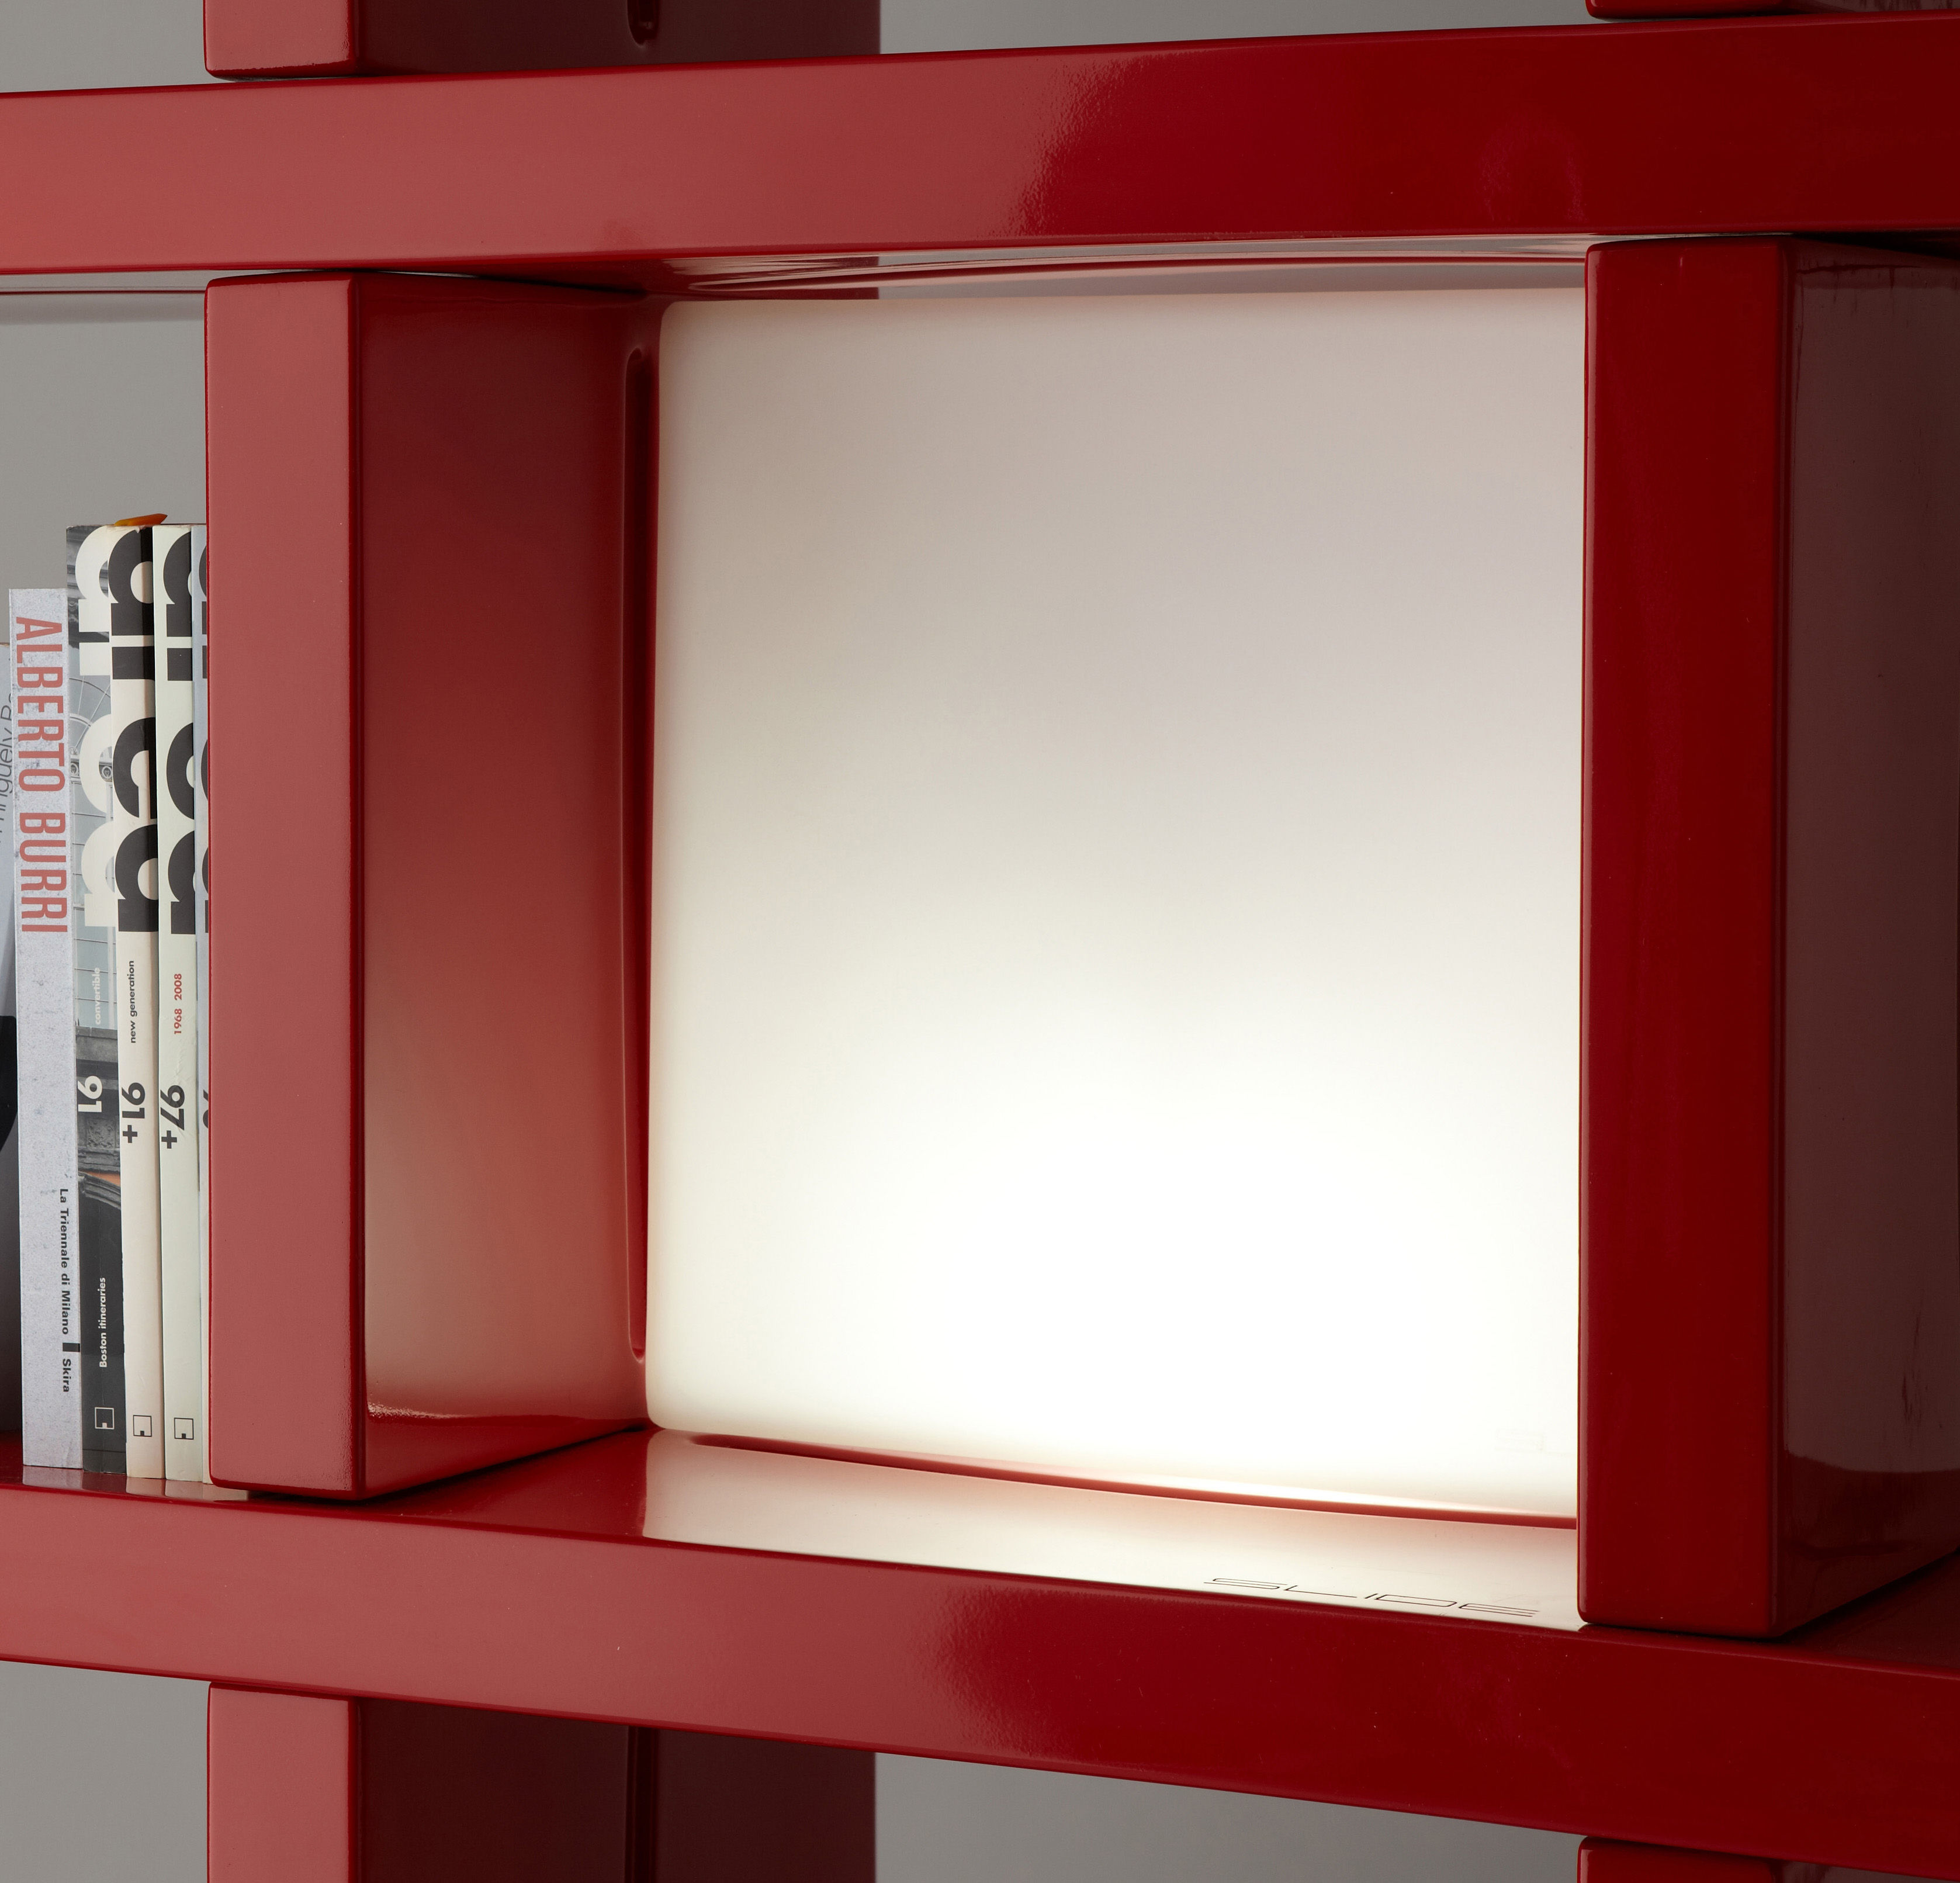 Quadro / Cube lumineux 40 x 40 cm Lamp - For bookshelf by Slide